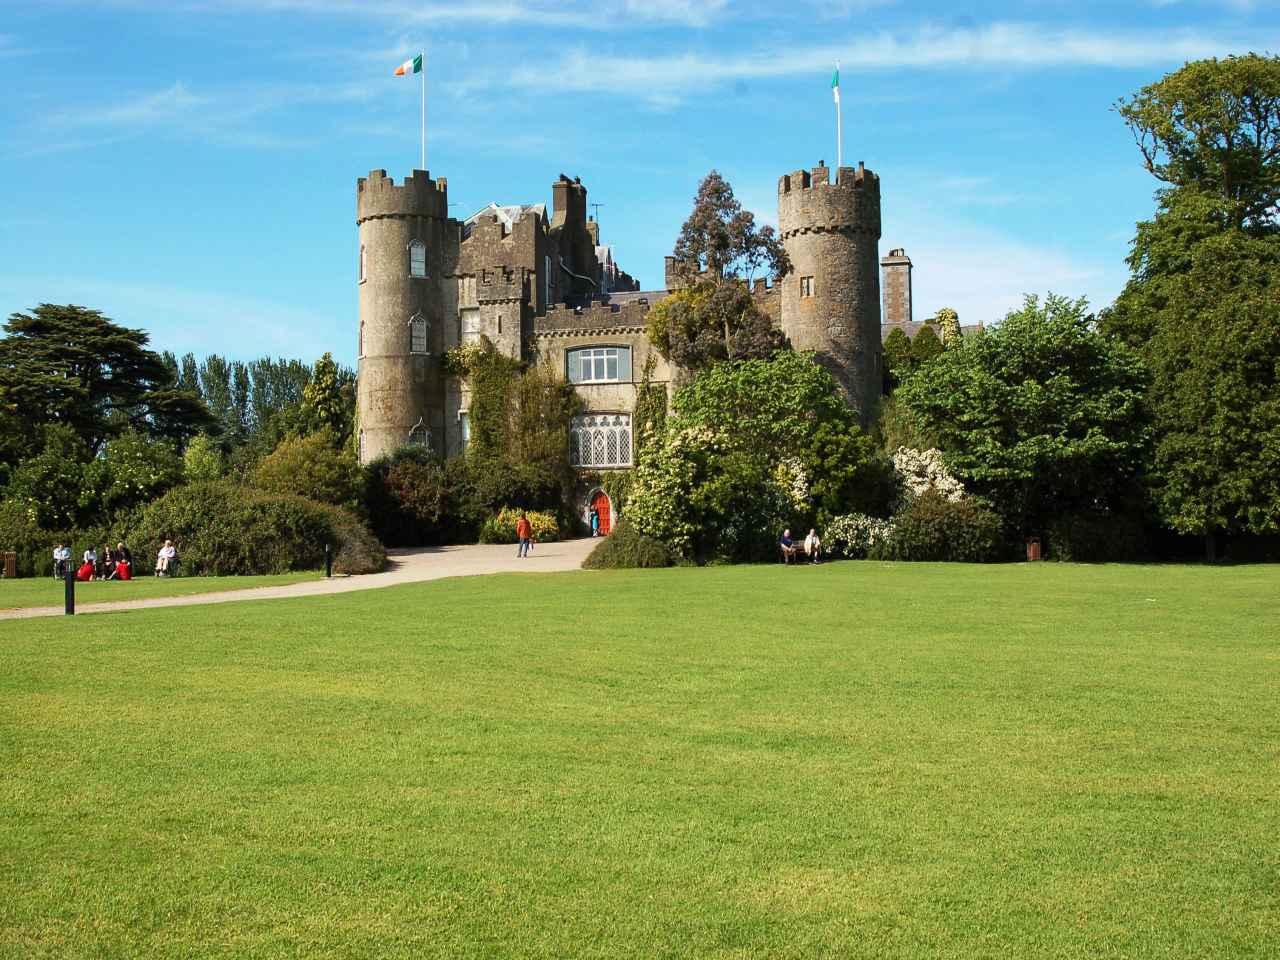 La magia de Dublin: Los fantasmas del Castillo Malahide